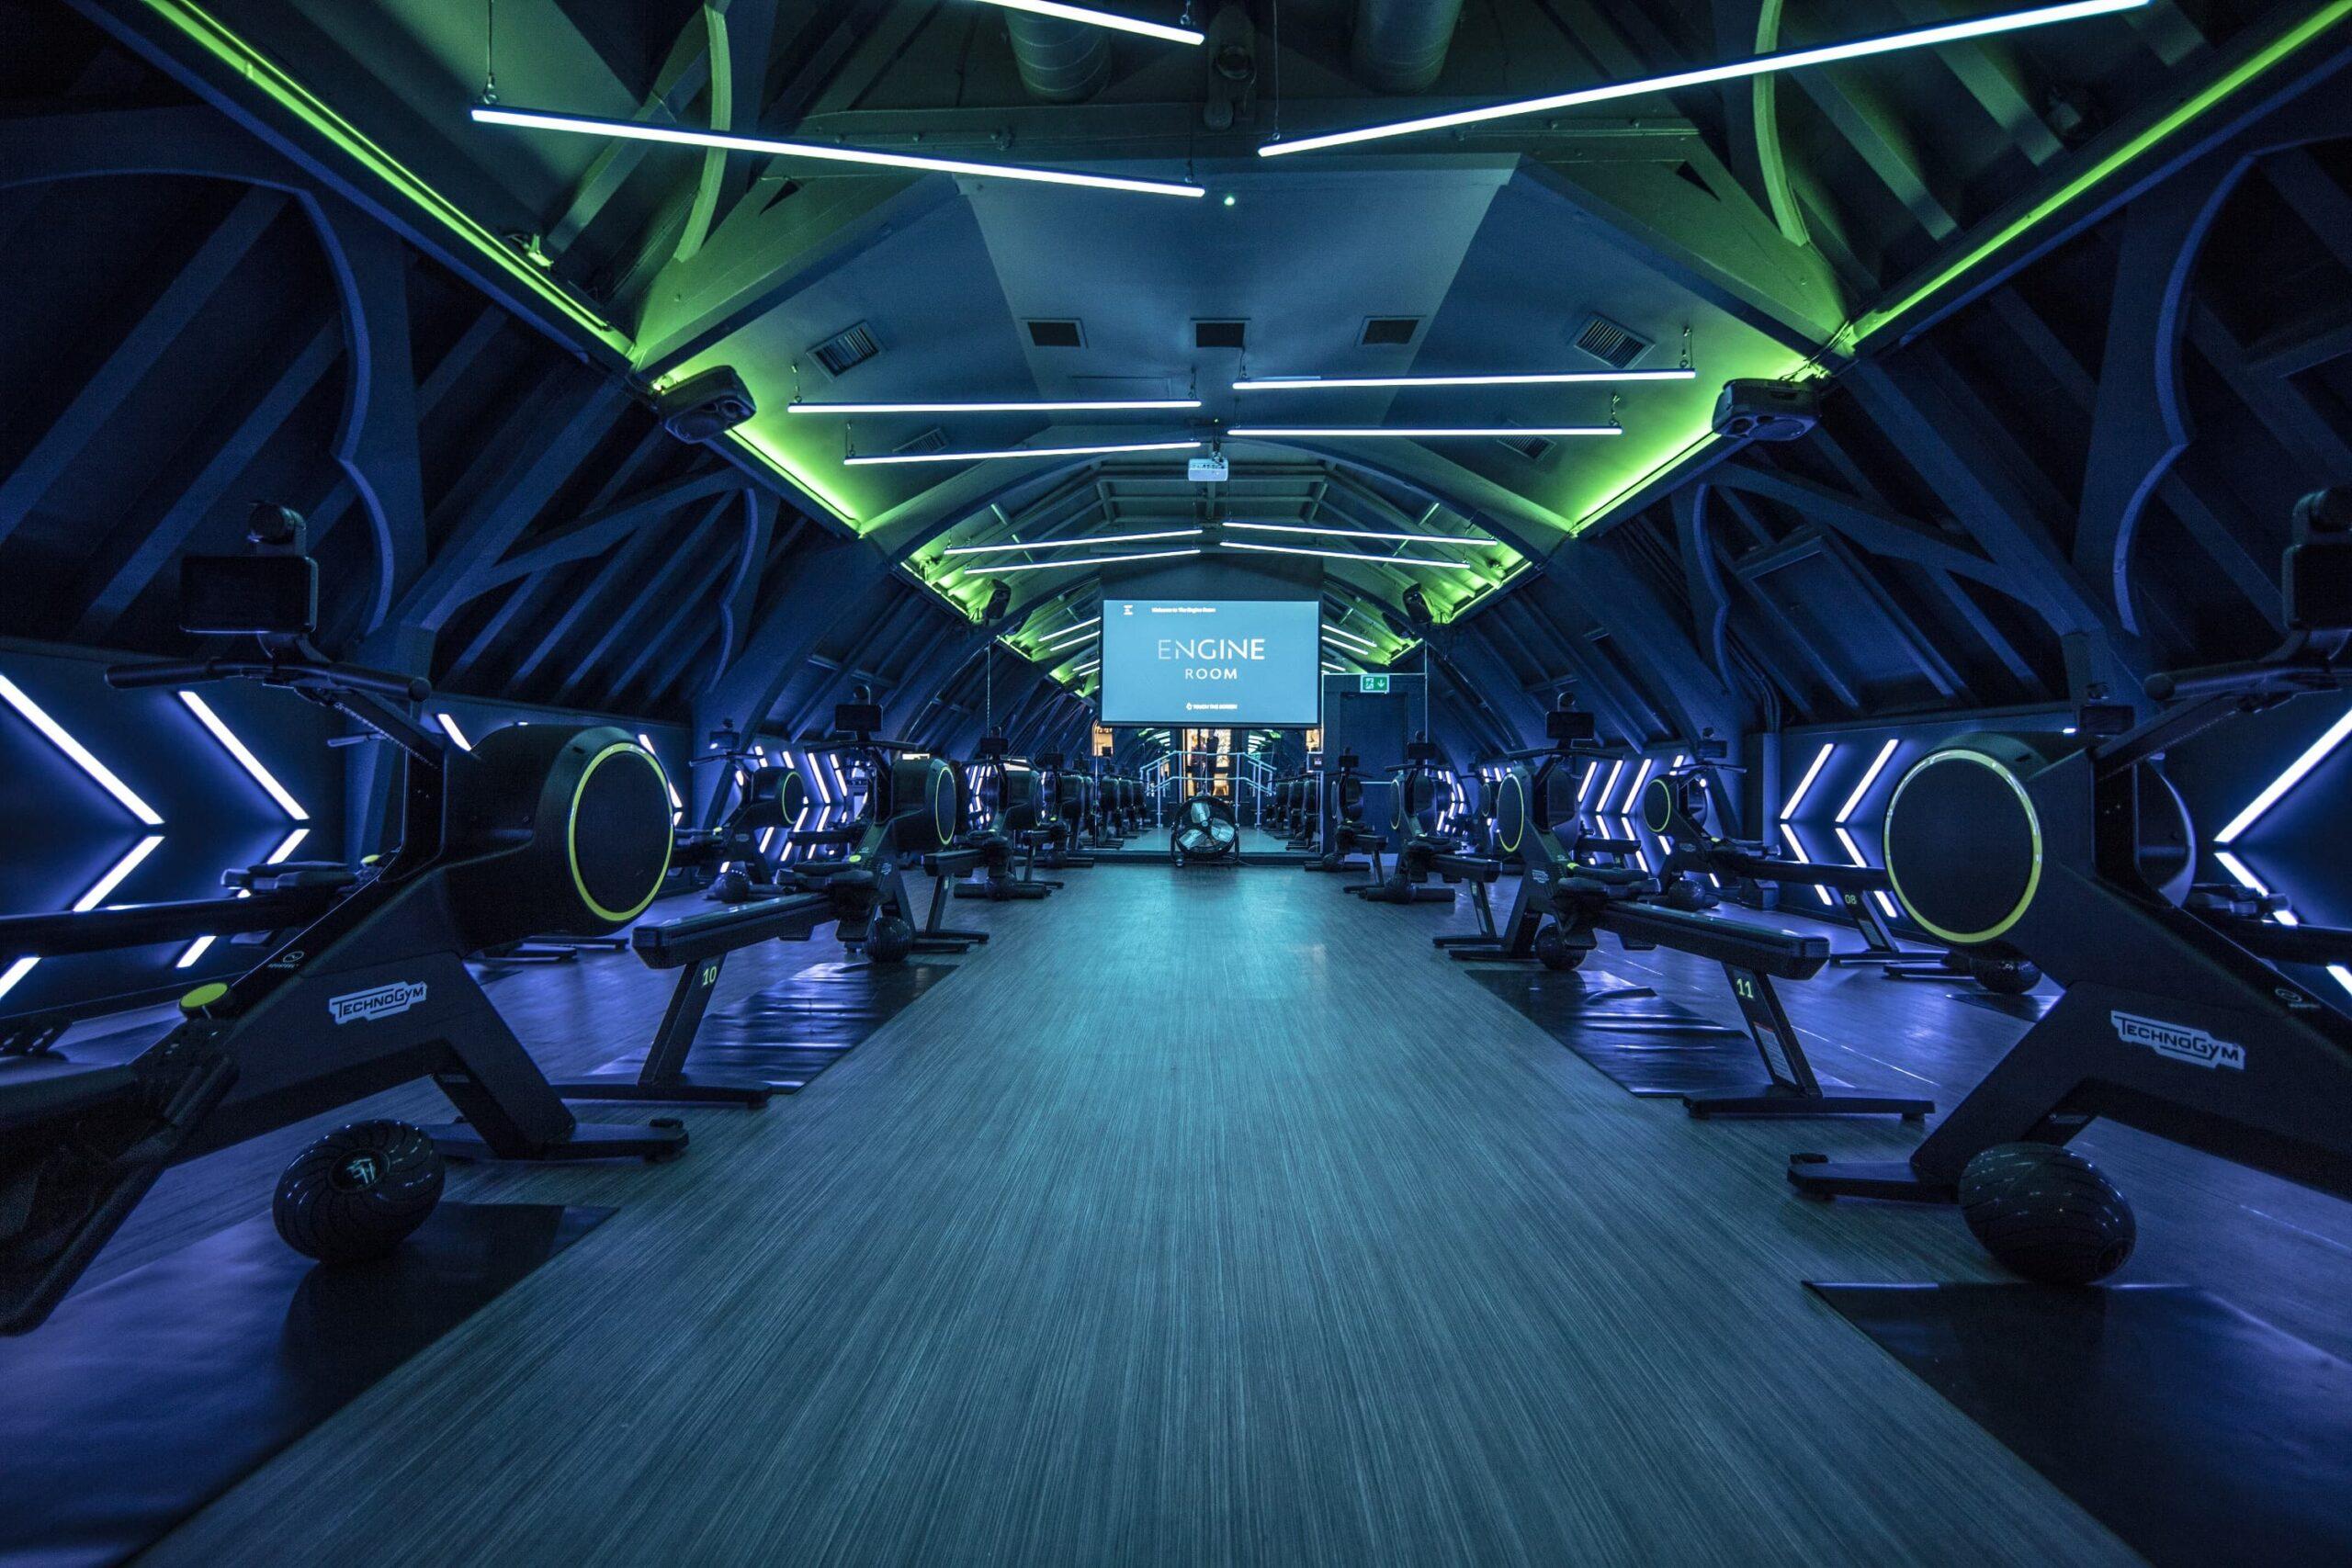 is indoor rowing good for cardio